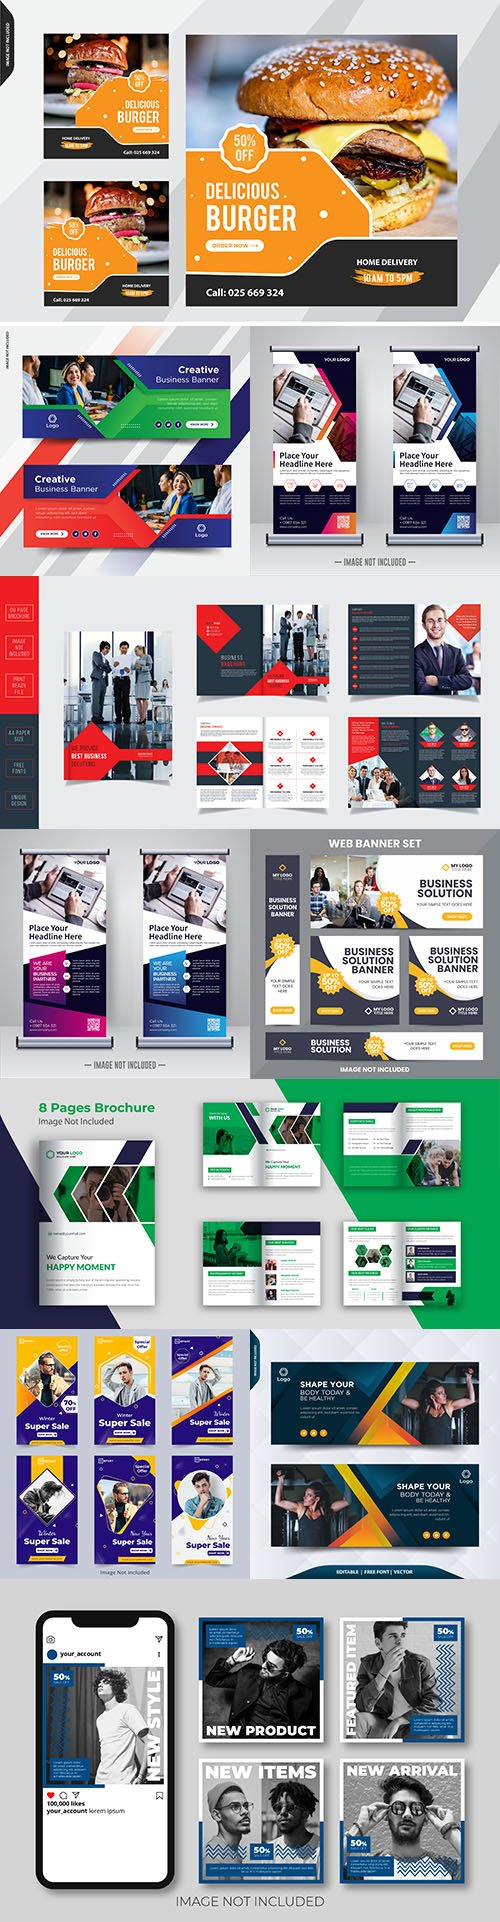 Business creative banner, brochures design template